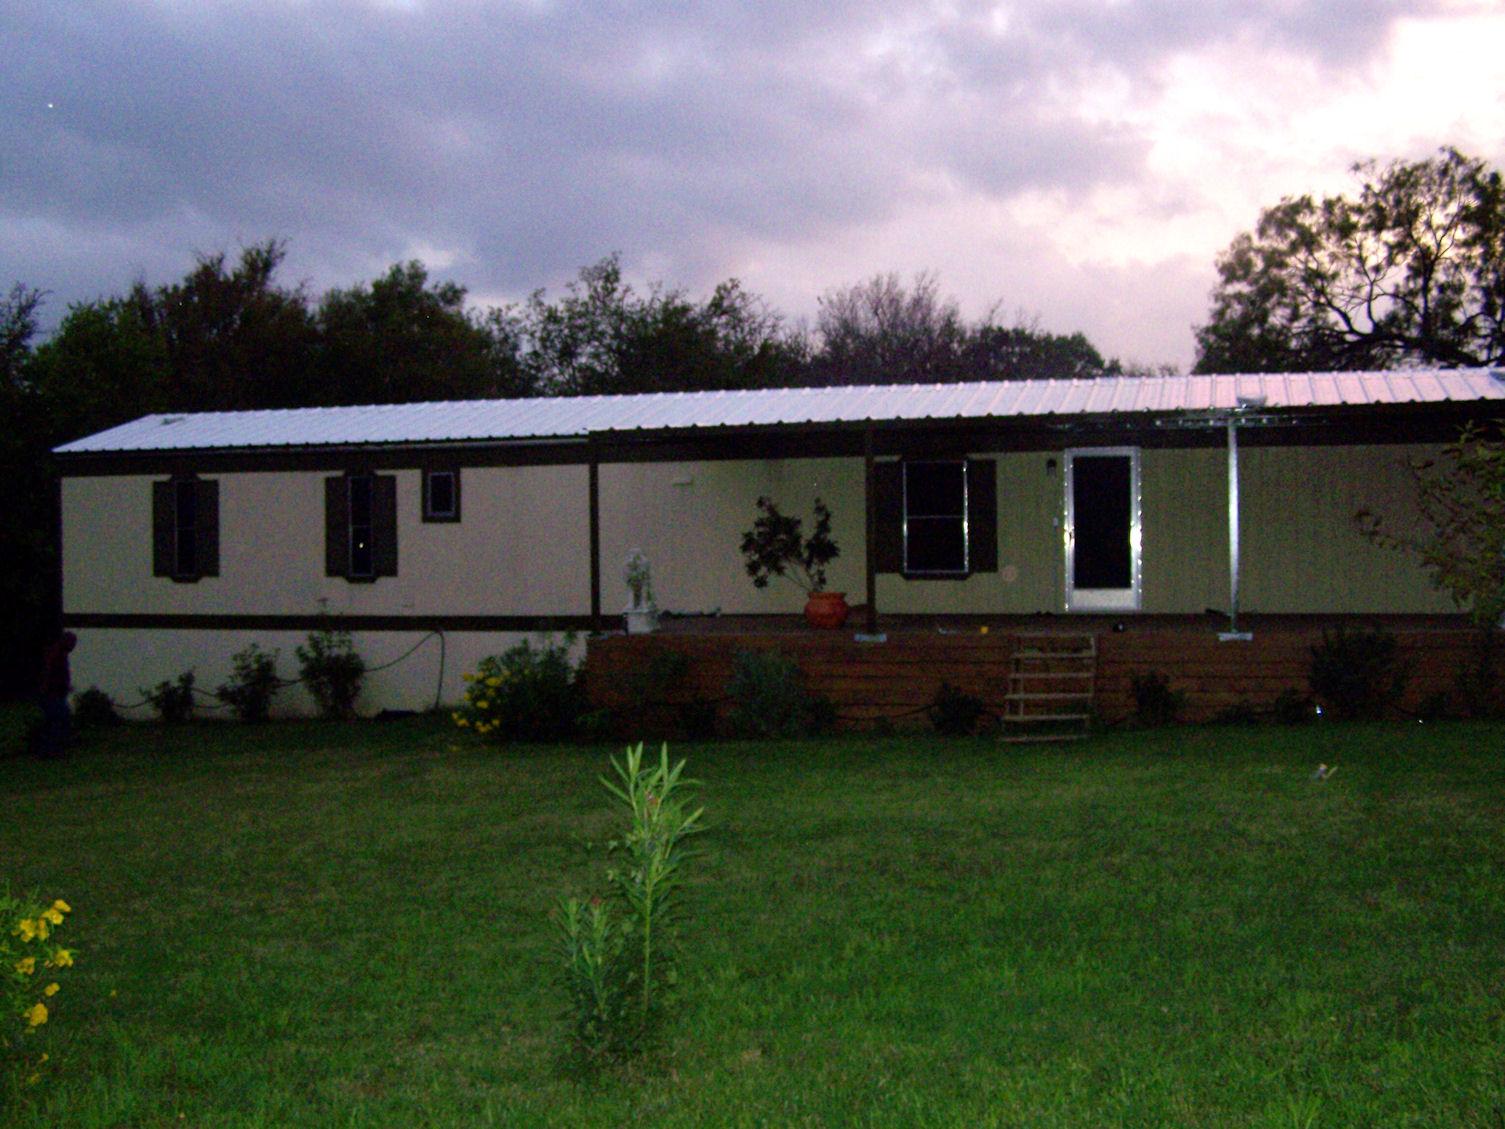 Mobile Home Roofing Joy Studio Design Gallery Best Design